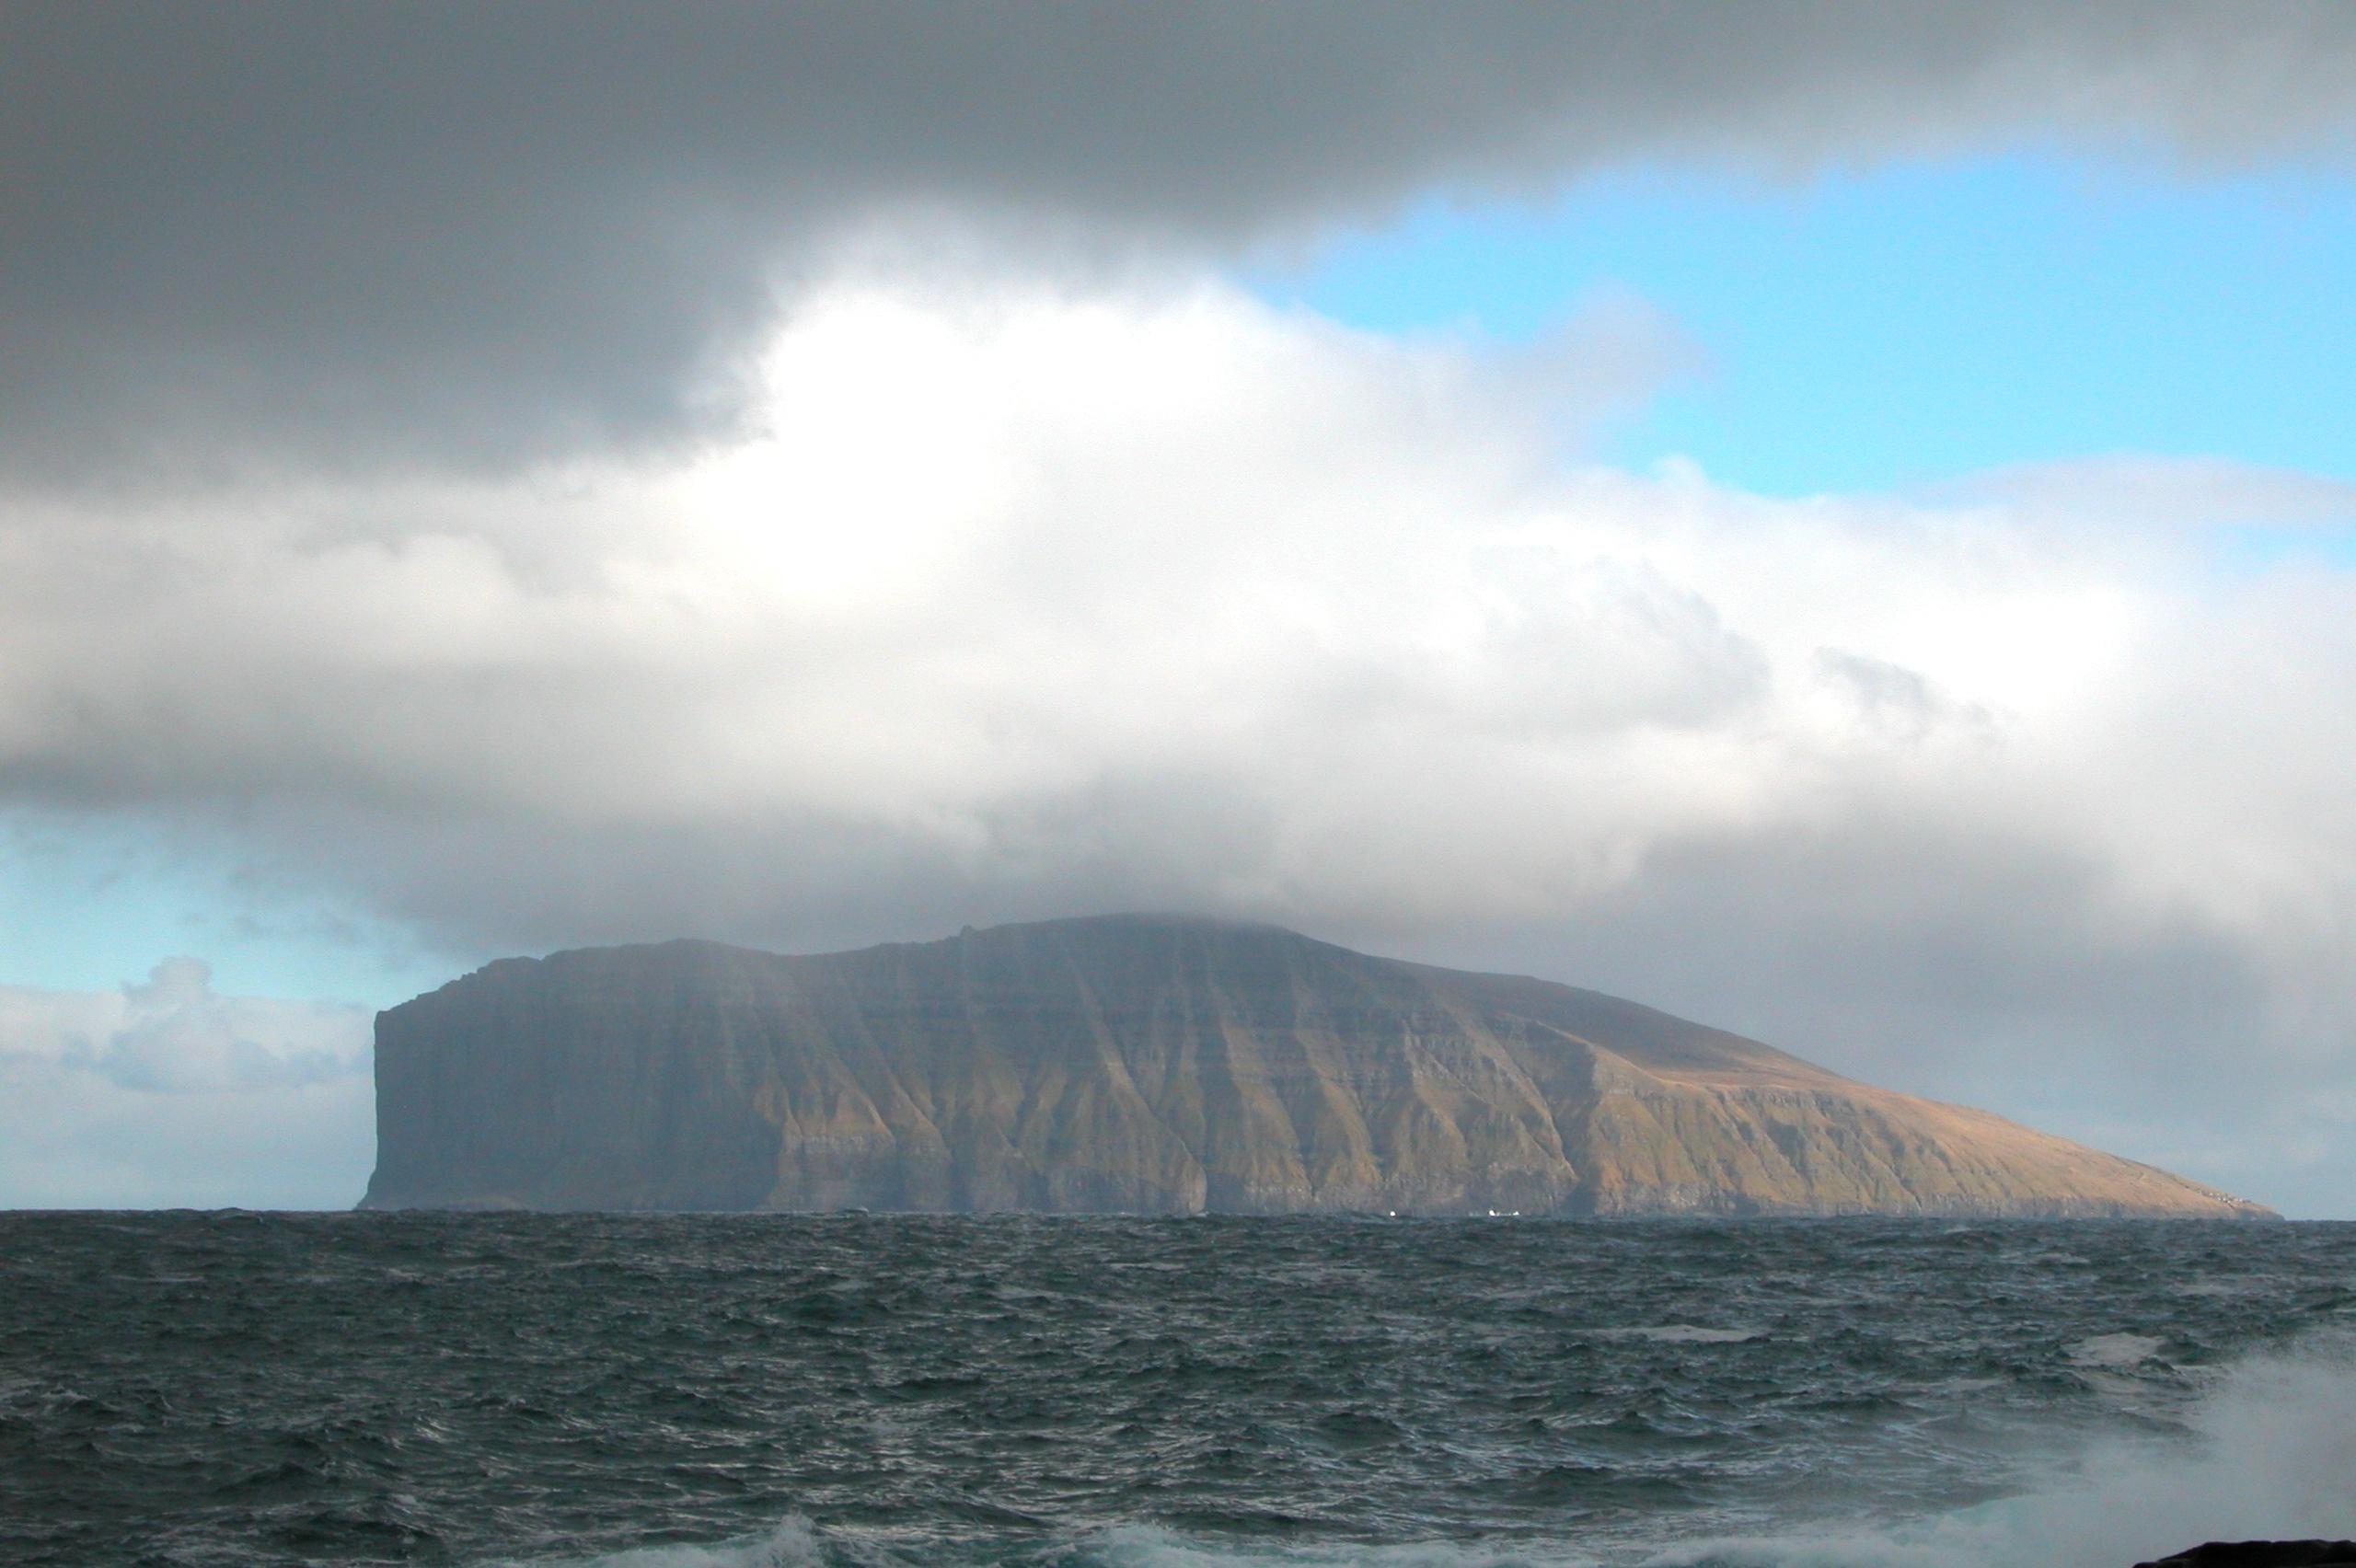 https://upload.wikimedia.org/wikipedia/commons/c/c8/Fugloy,_Faroe_Islands.JPG